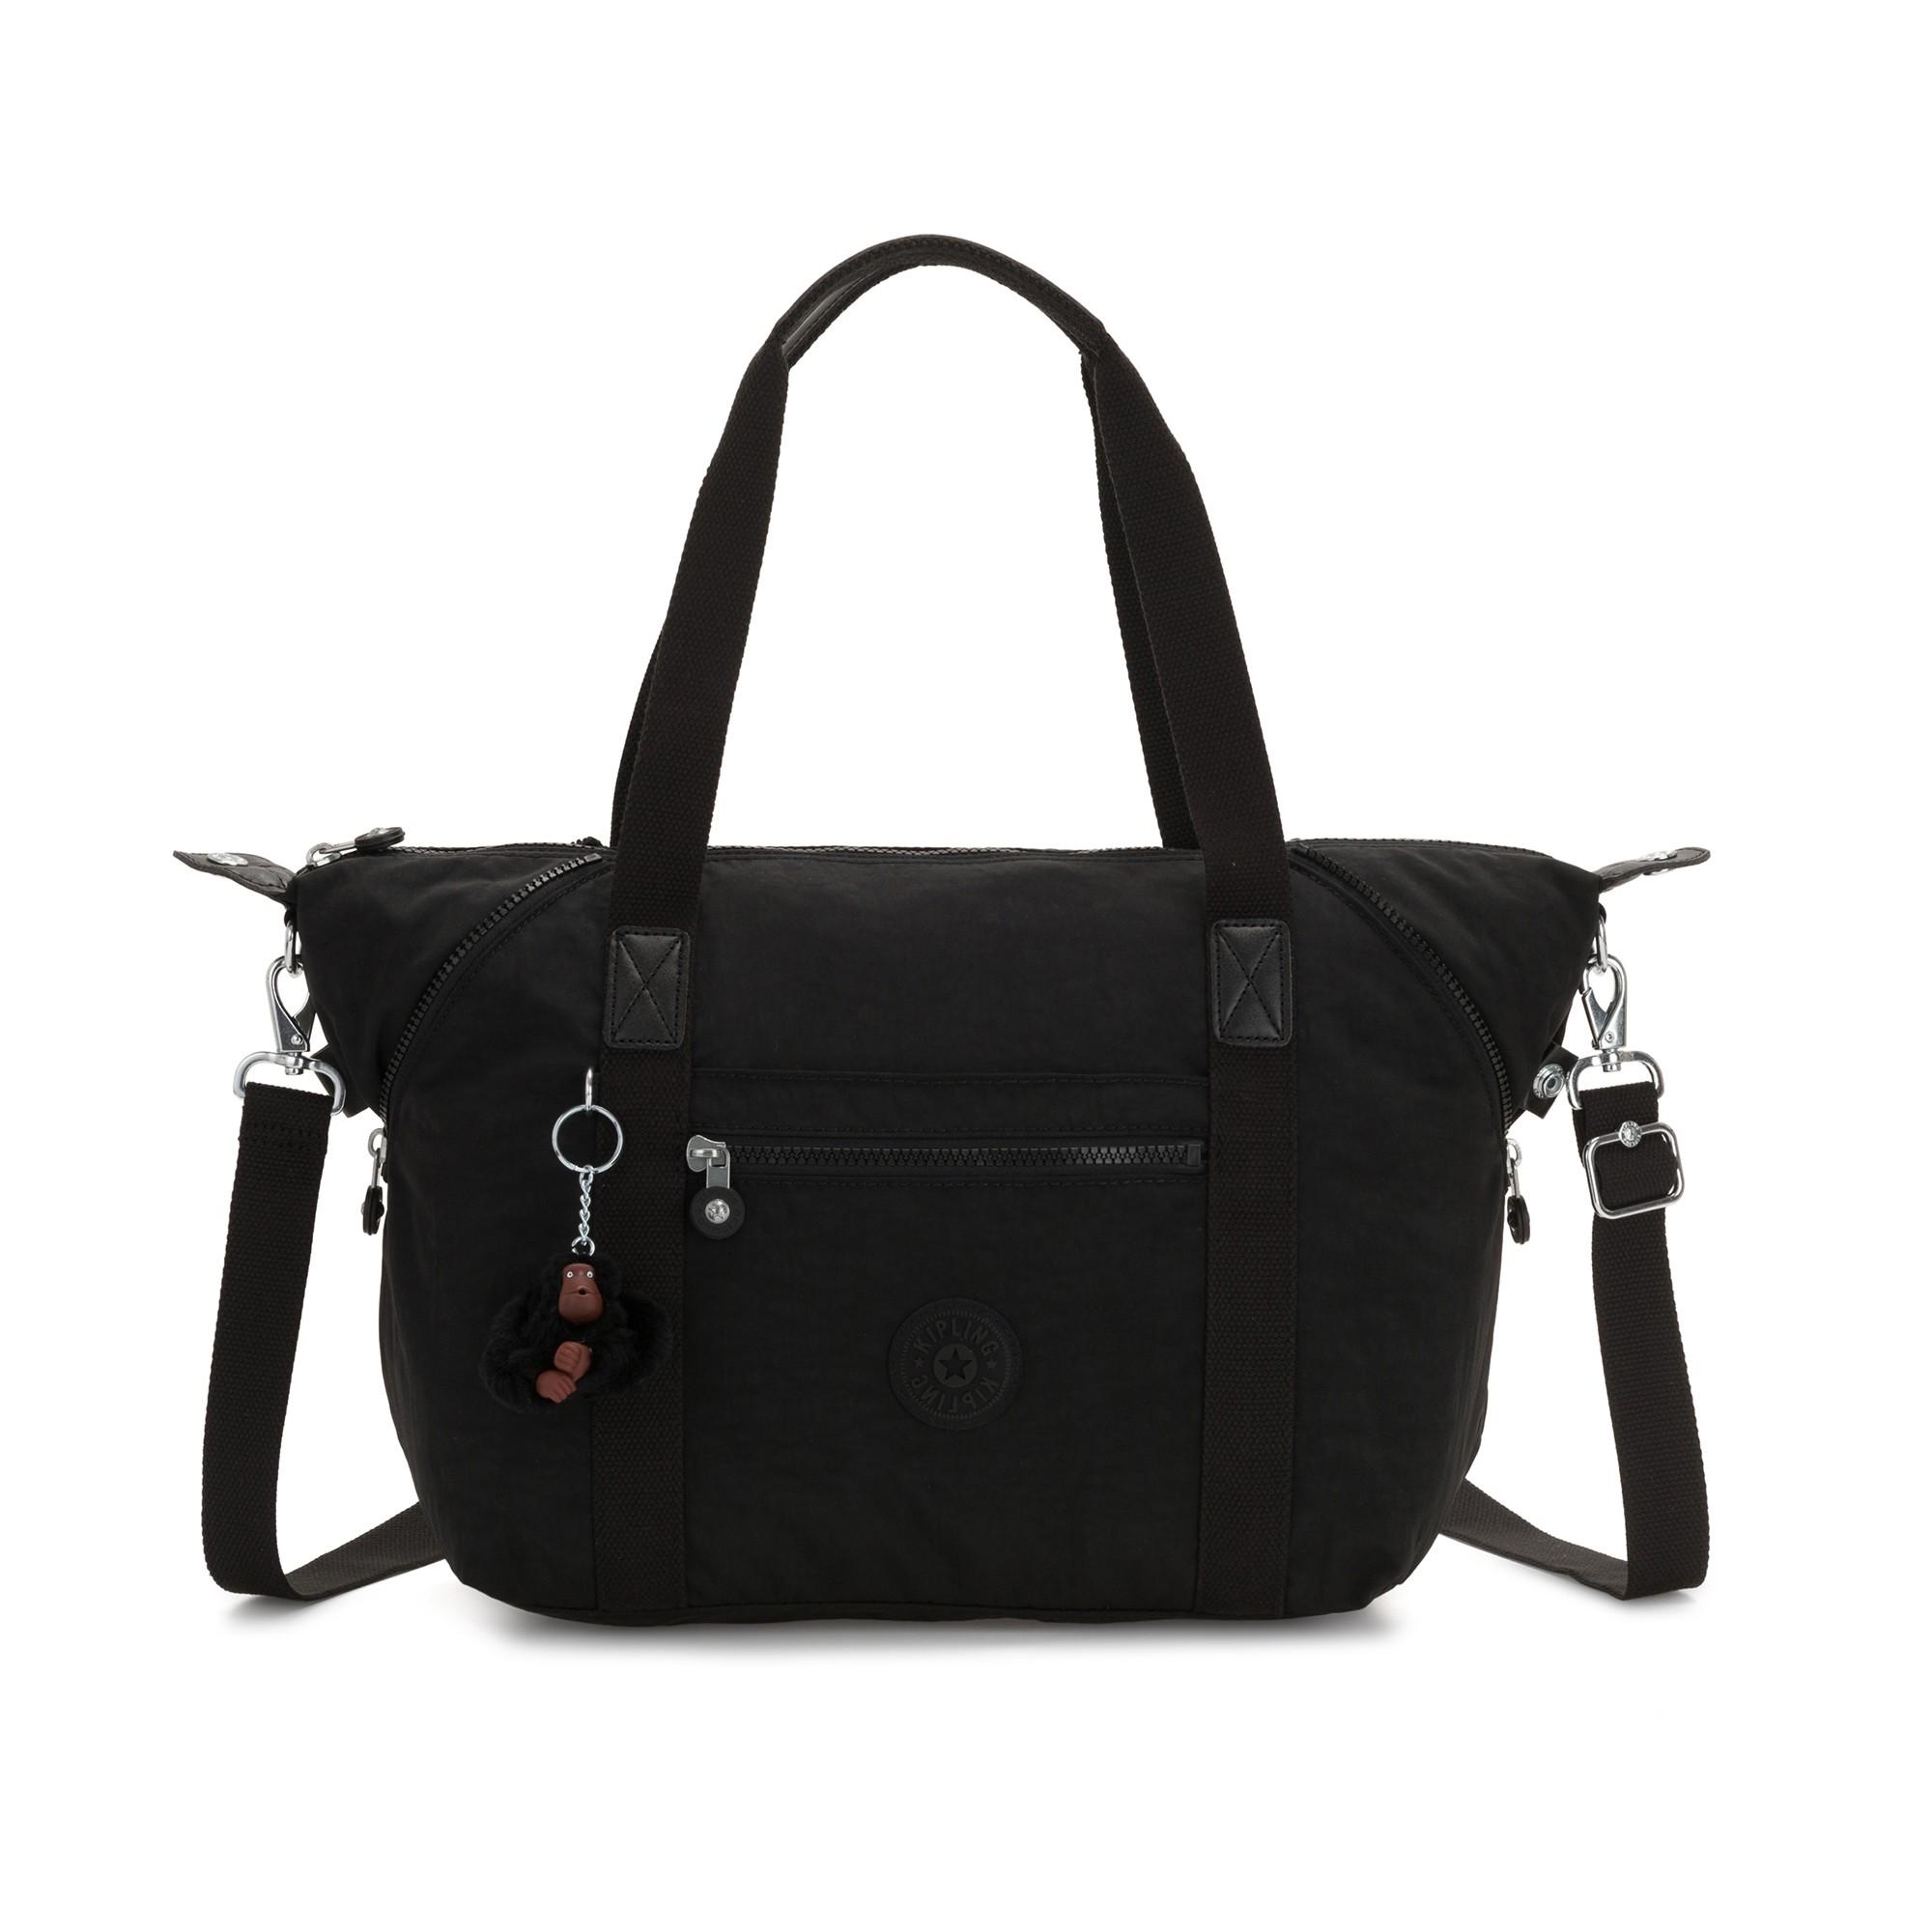 KIPLING Tasche K10619 TRUE BLACK